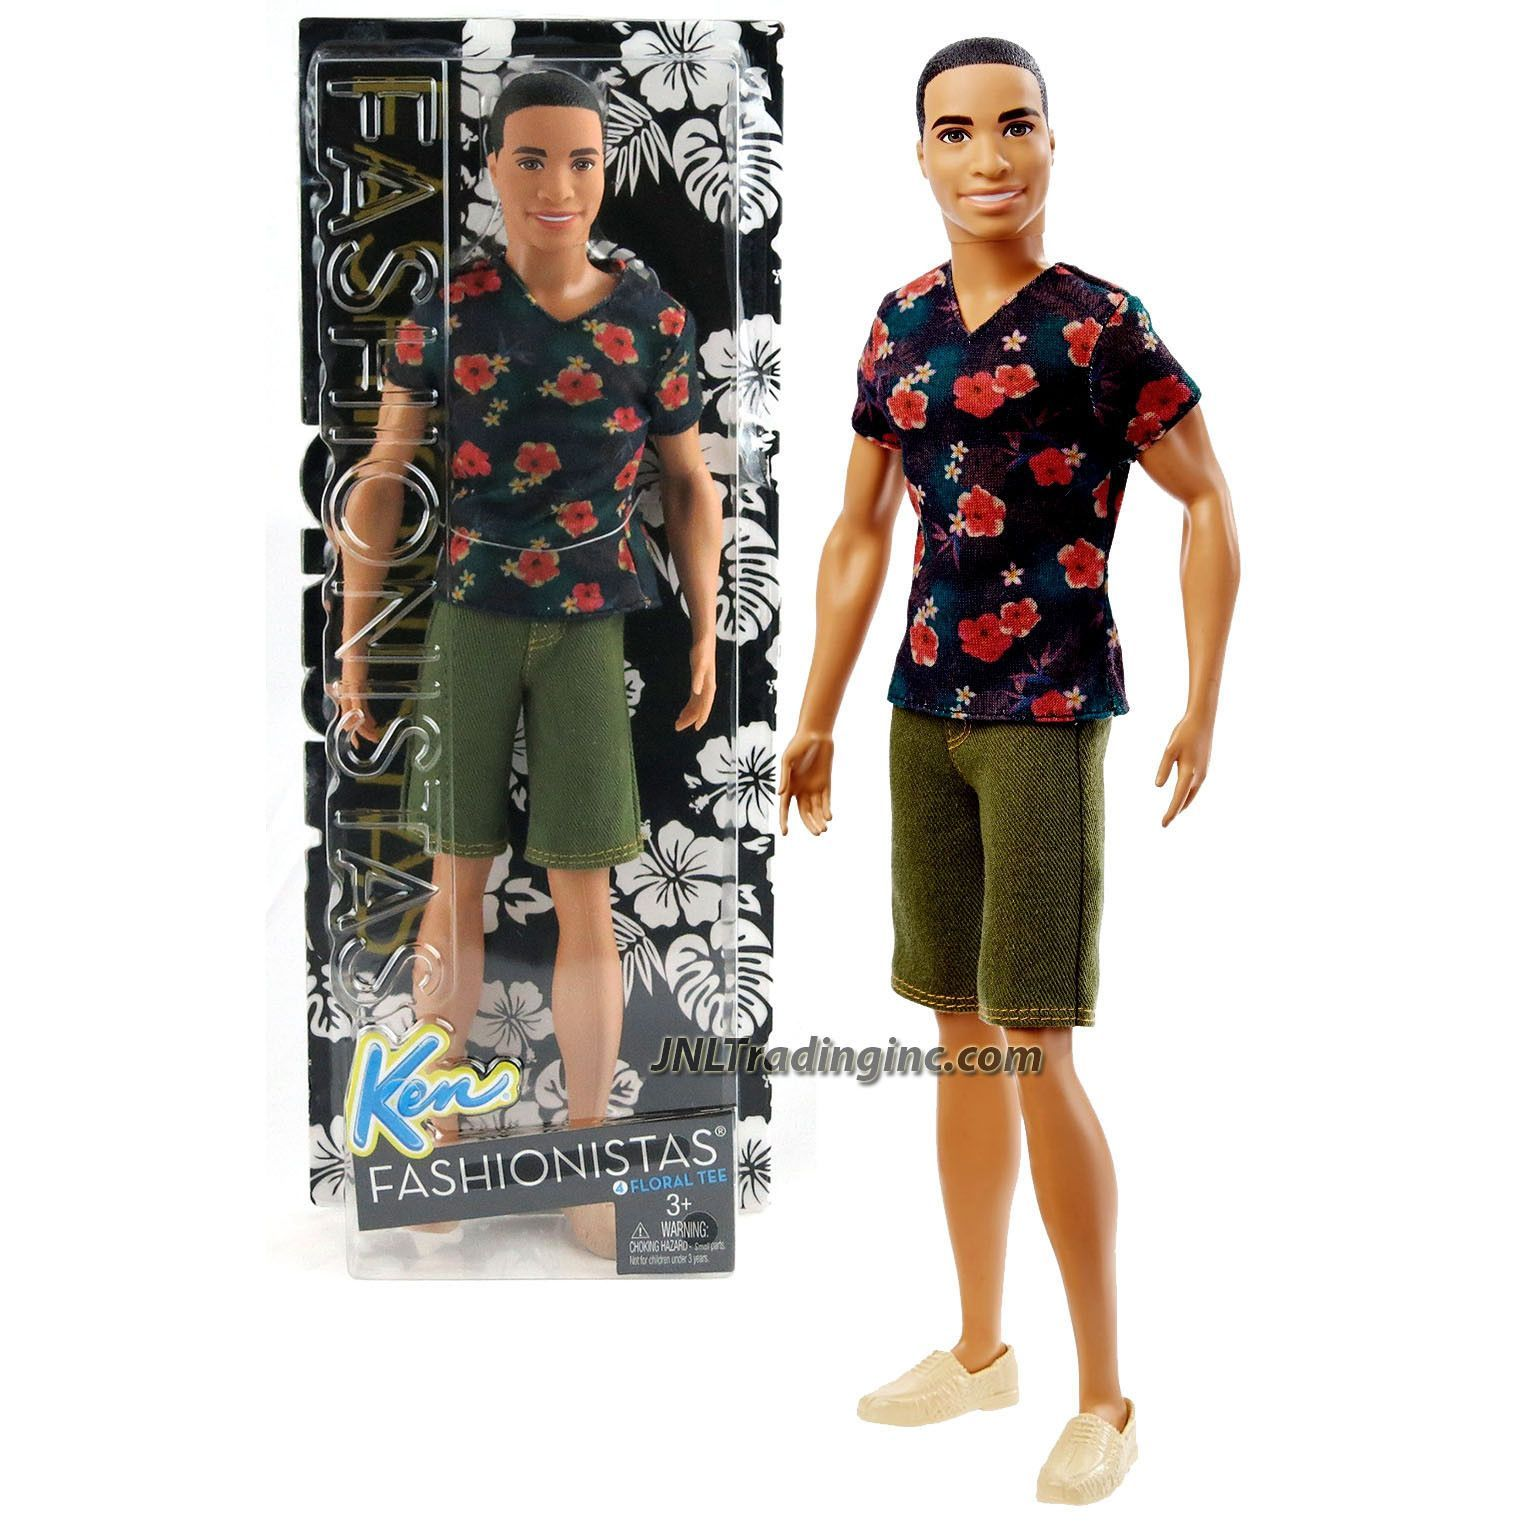 Barbie Nail Art Games Free Download: Ooak Ken Fashionista